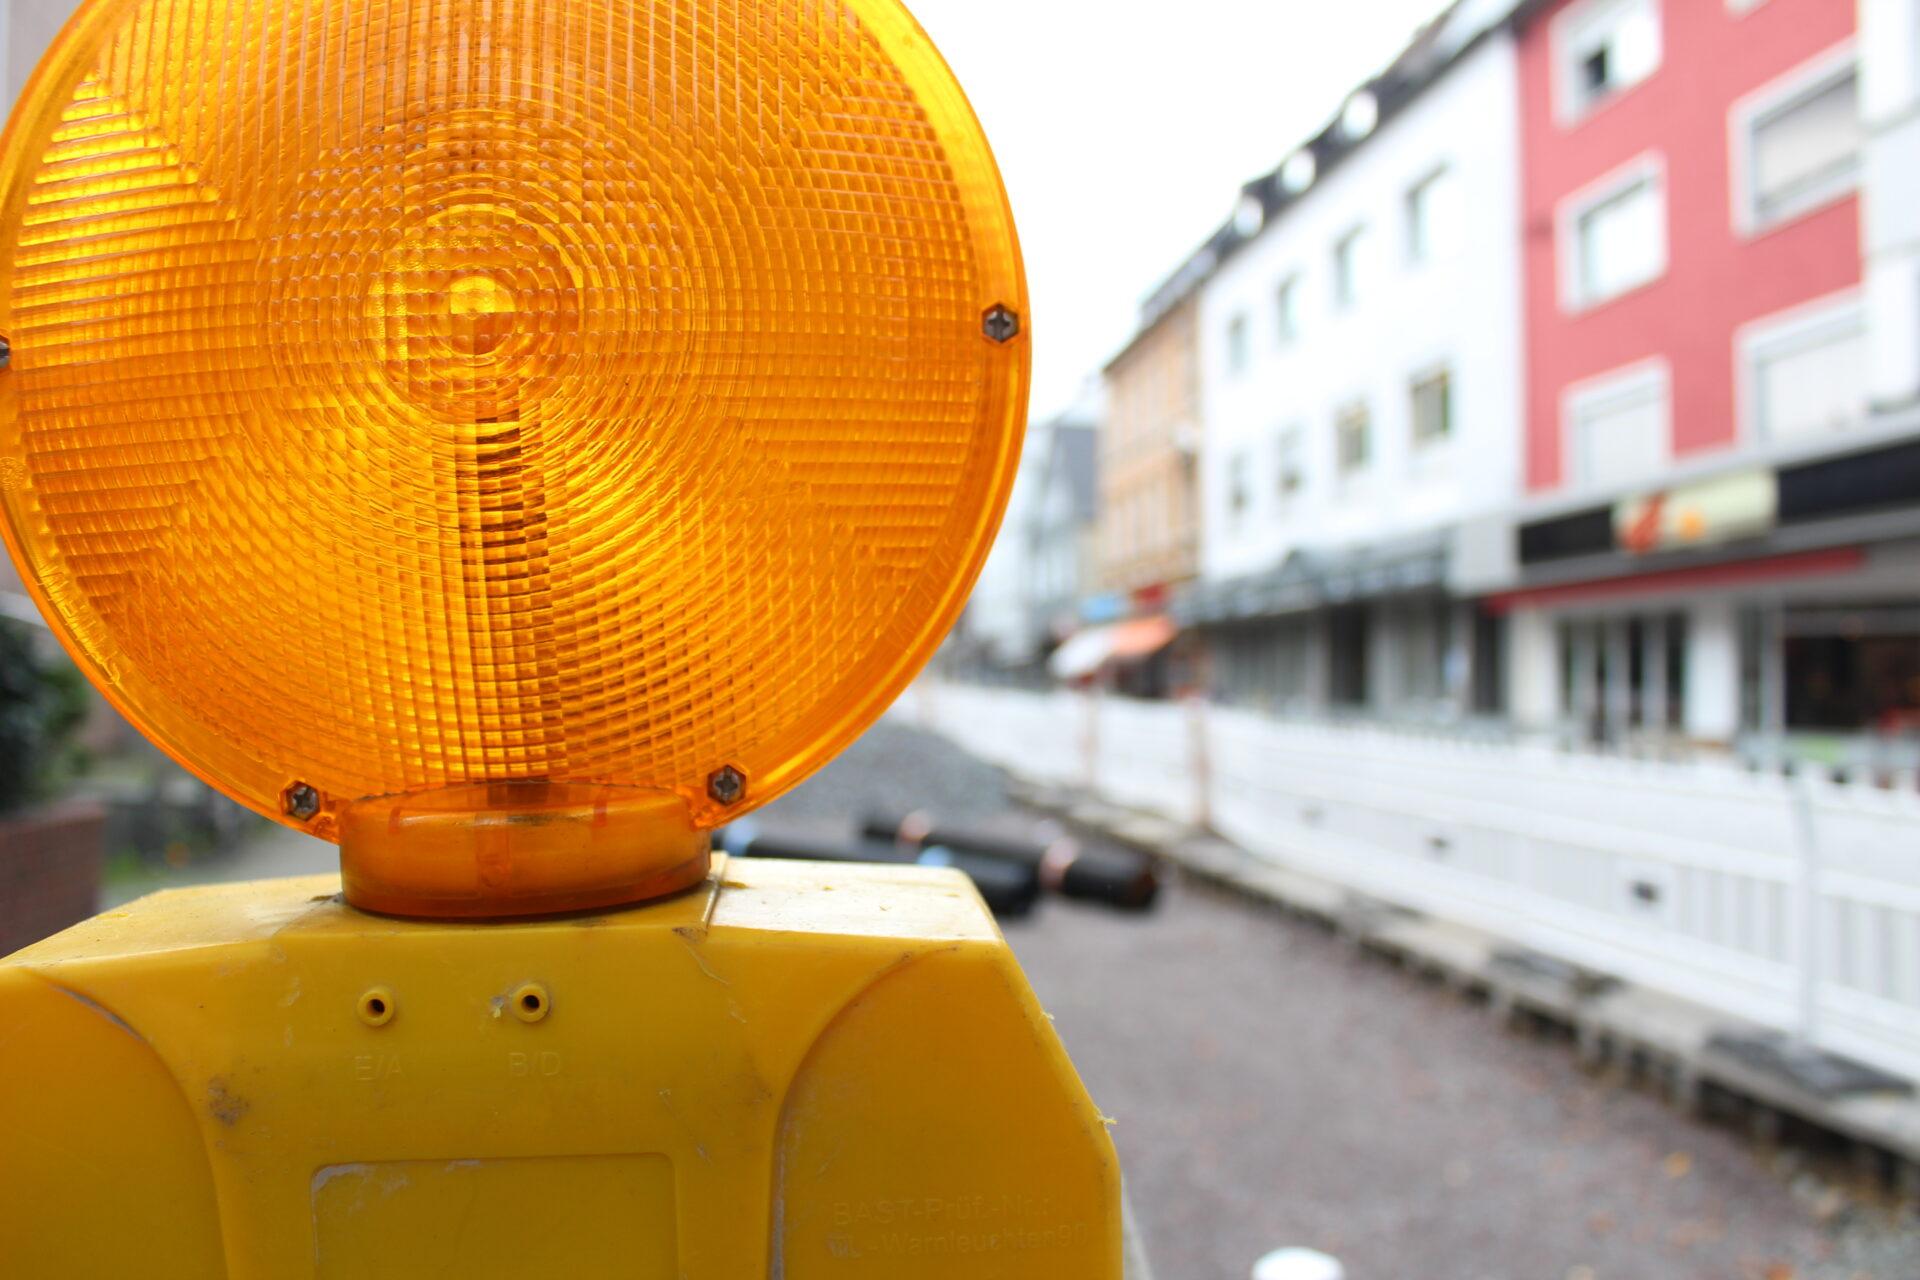 CDU Fraktion: Endlich sinnvolle Entlastung bei Straßenbaumaßnahmen